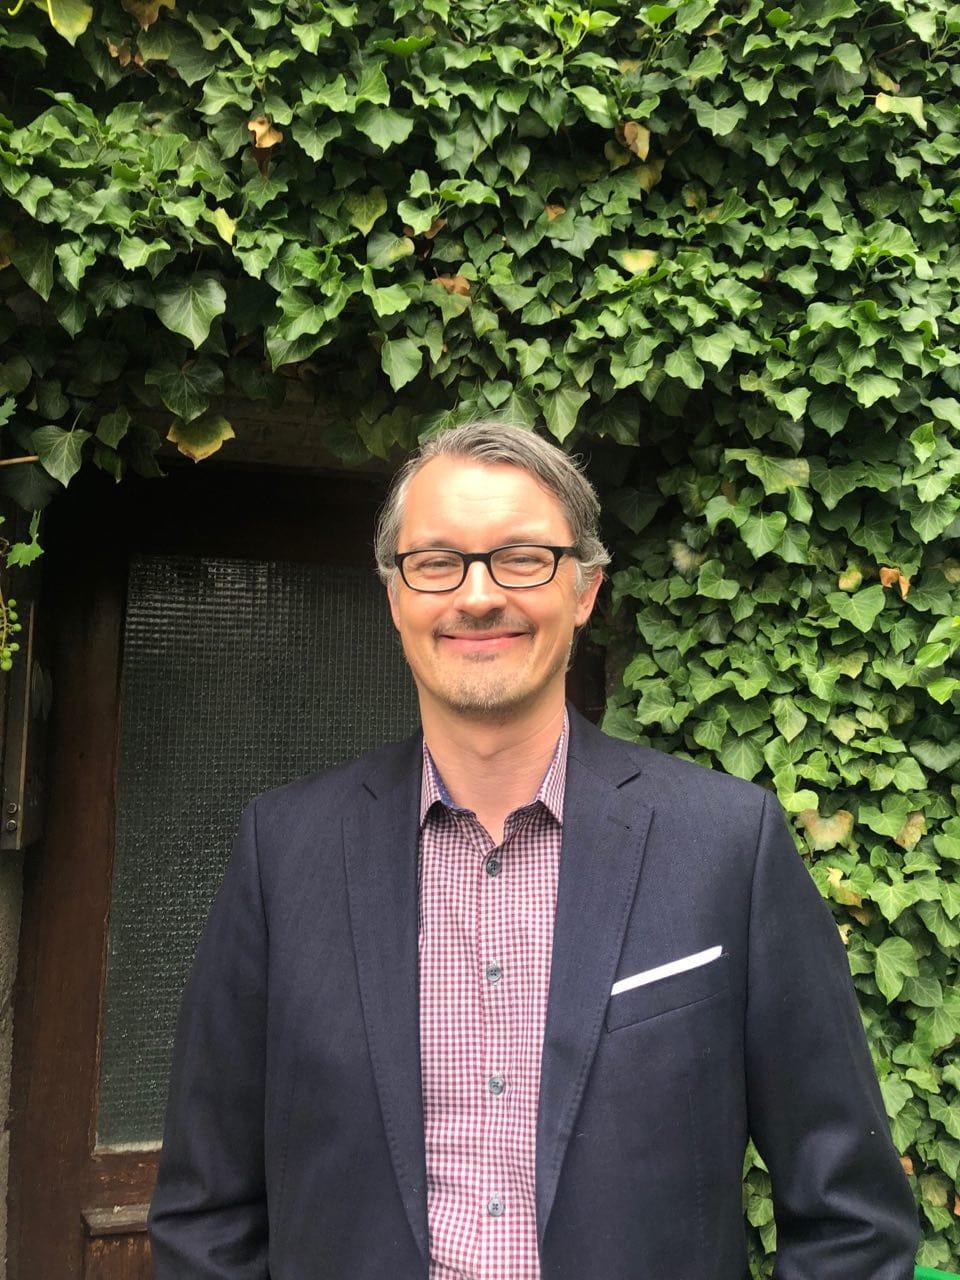 Jens Schwamborn OrganoTherapeutics